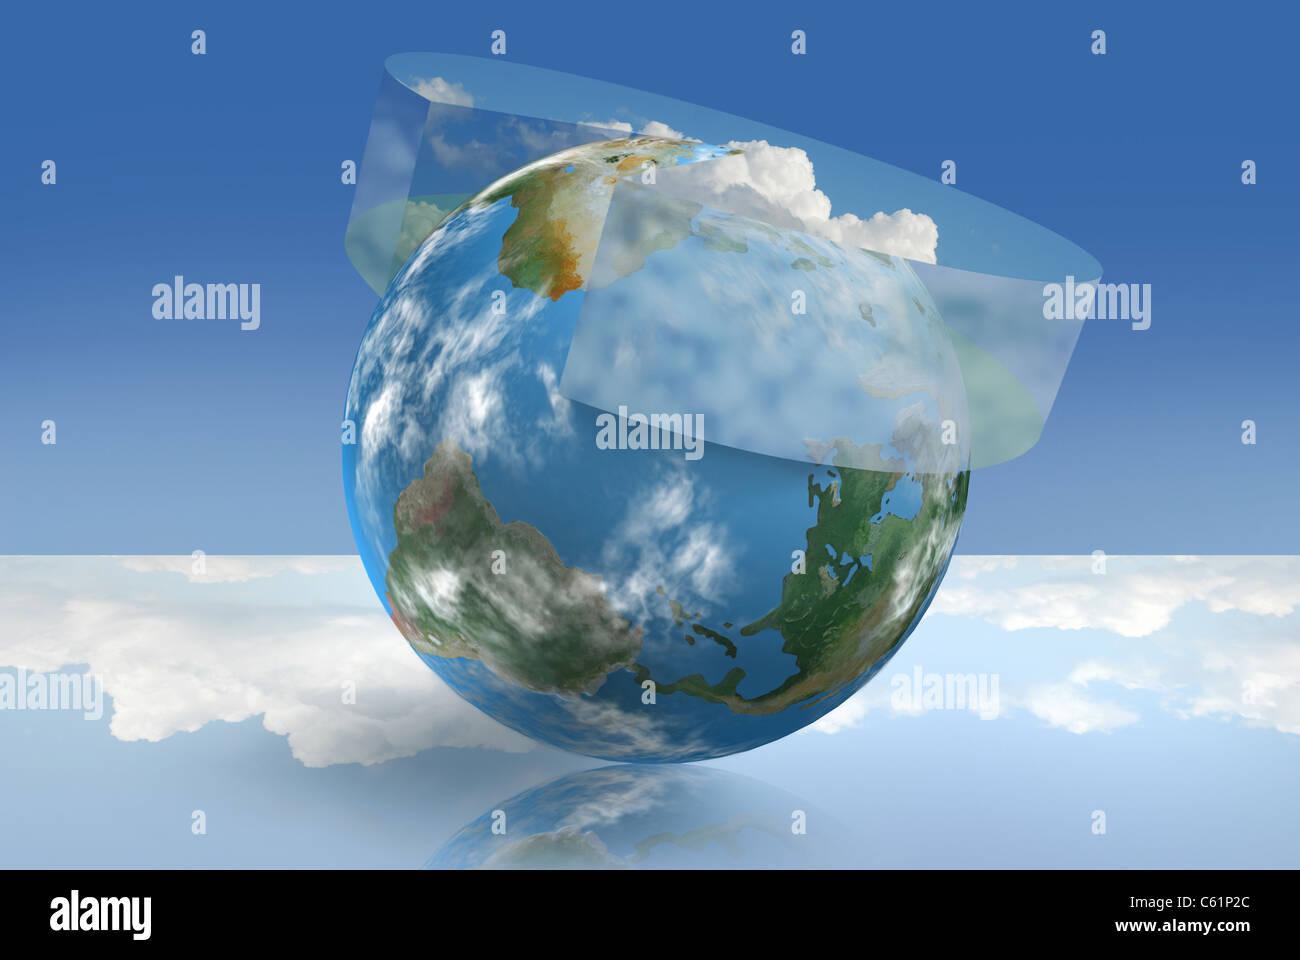 Tecnología de control climático ilustrado con un gráfico de tarta atmosférica Imagen De Stock